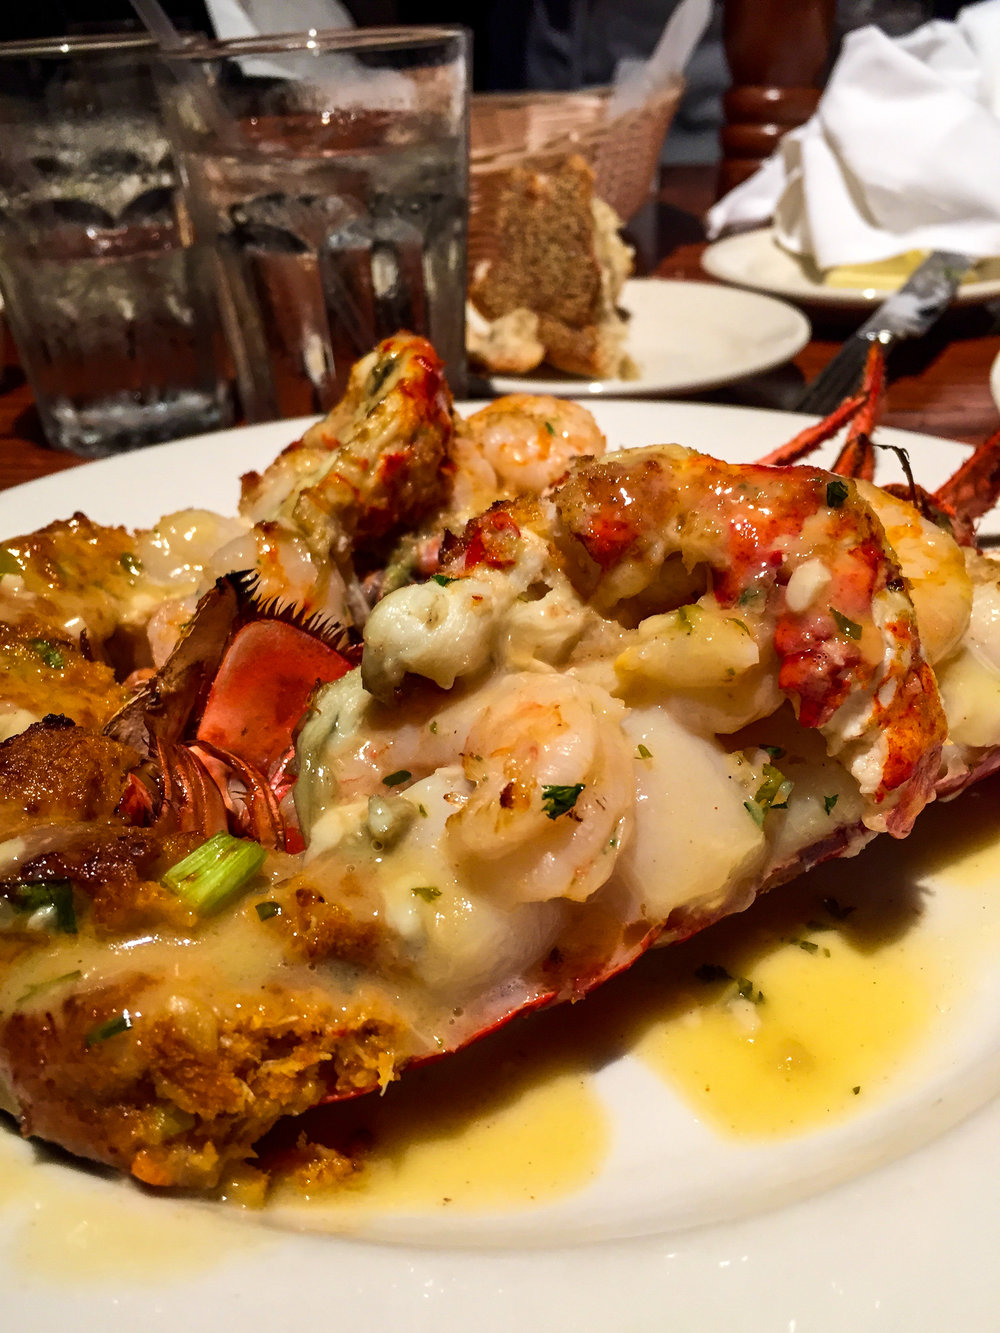 Stuffed Lobster Tail from Atlanta Fish Market - Maine lobster tail stuffed with lobster, shrimp scampi, scallops, honey-mustard aioli & drawn butter.$47.95